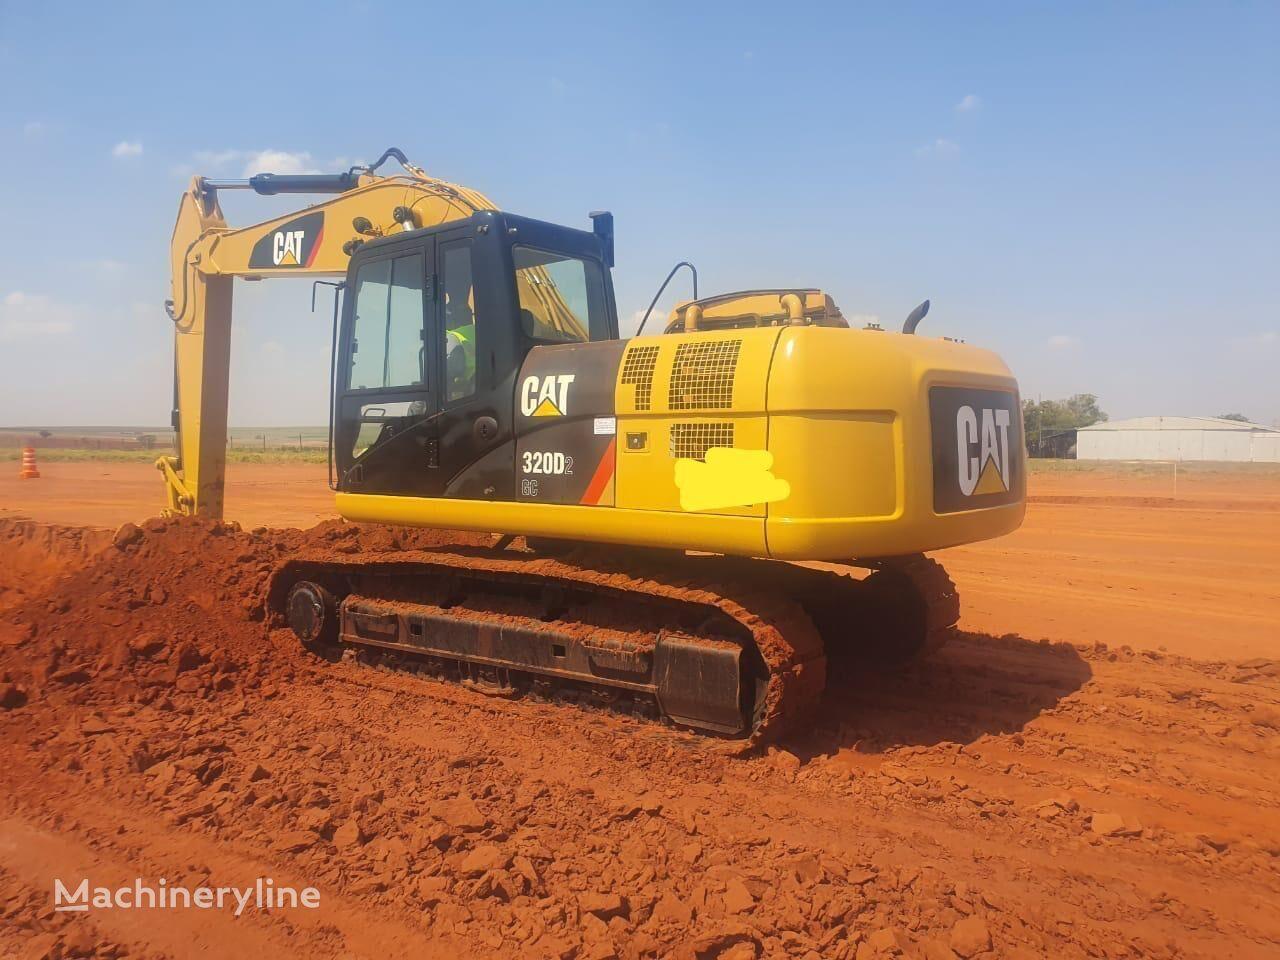 CATERPILLAR 320D2 GC tracked excavator